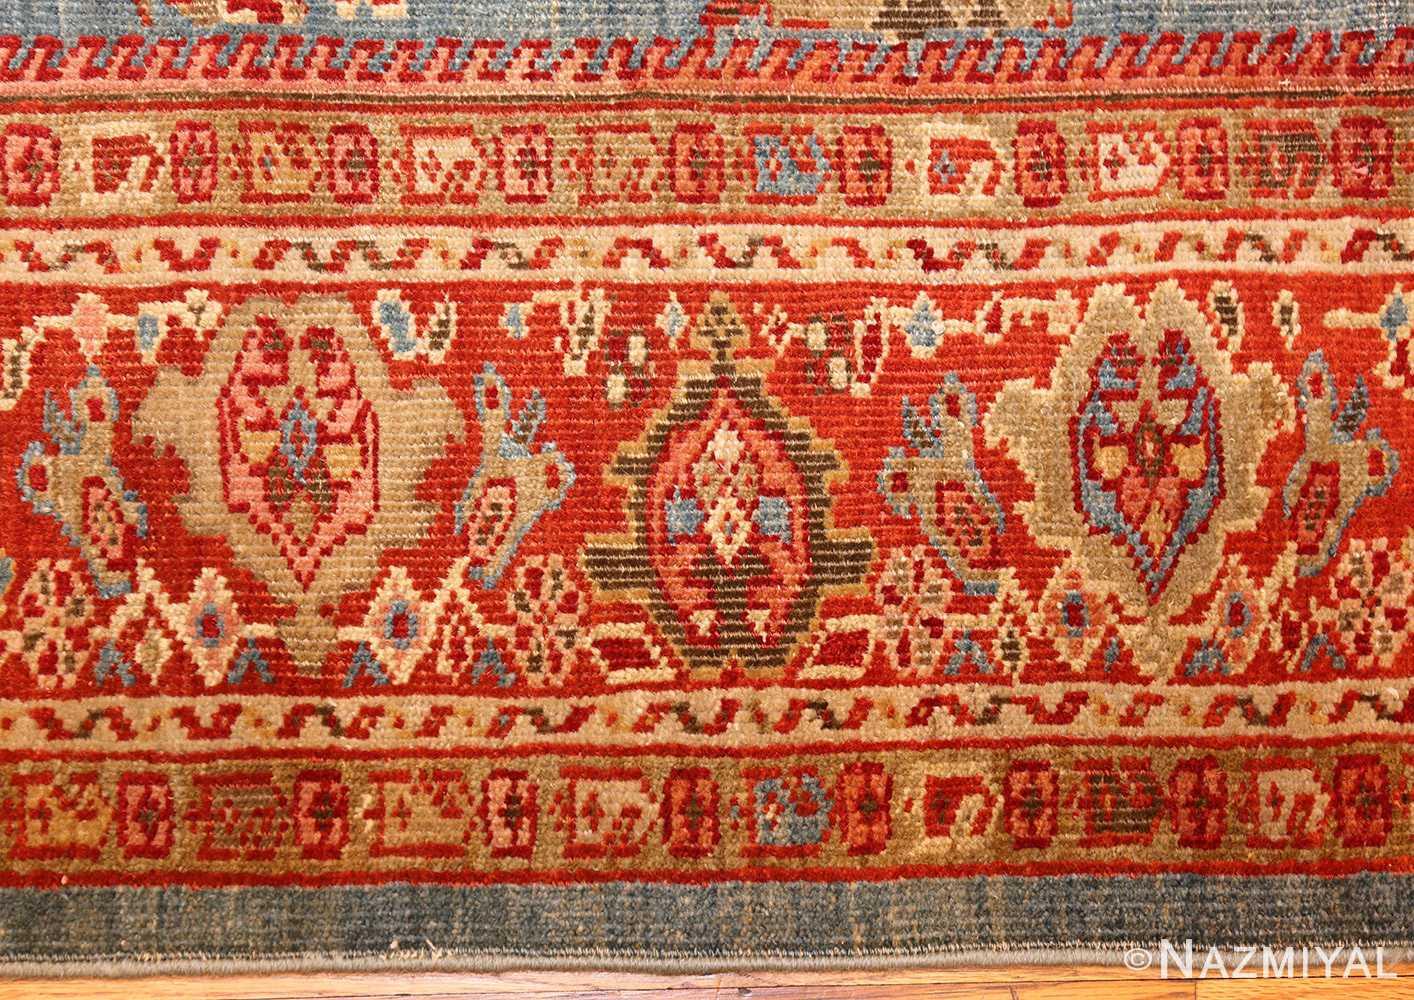 antique blue background persian sultanabad rug 49209 border Nazmiyal